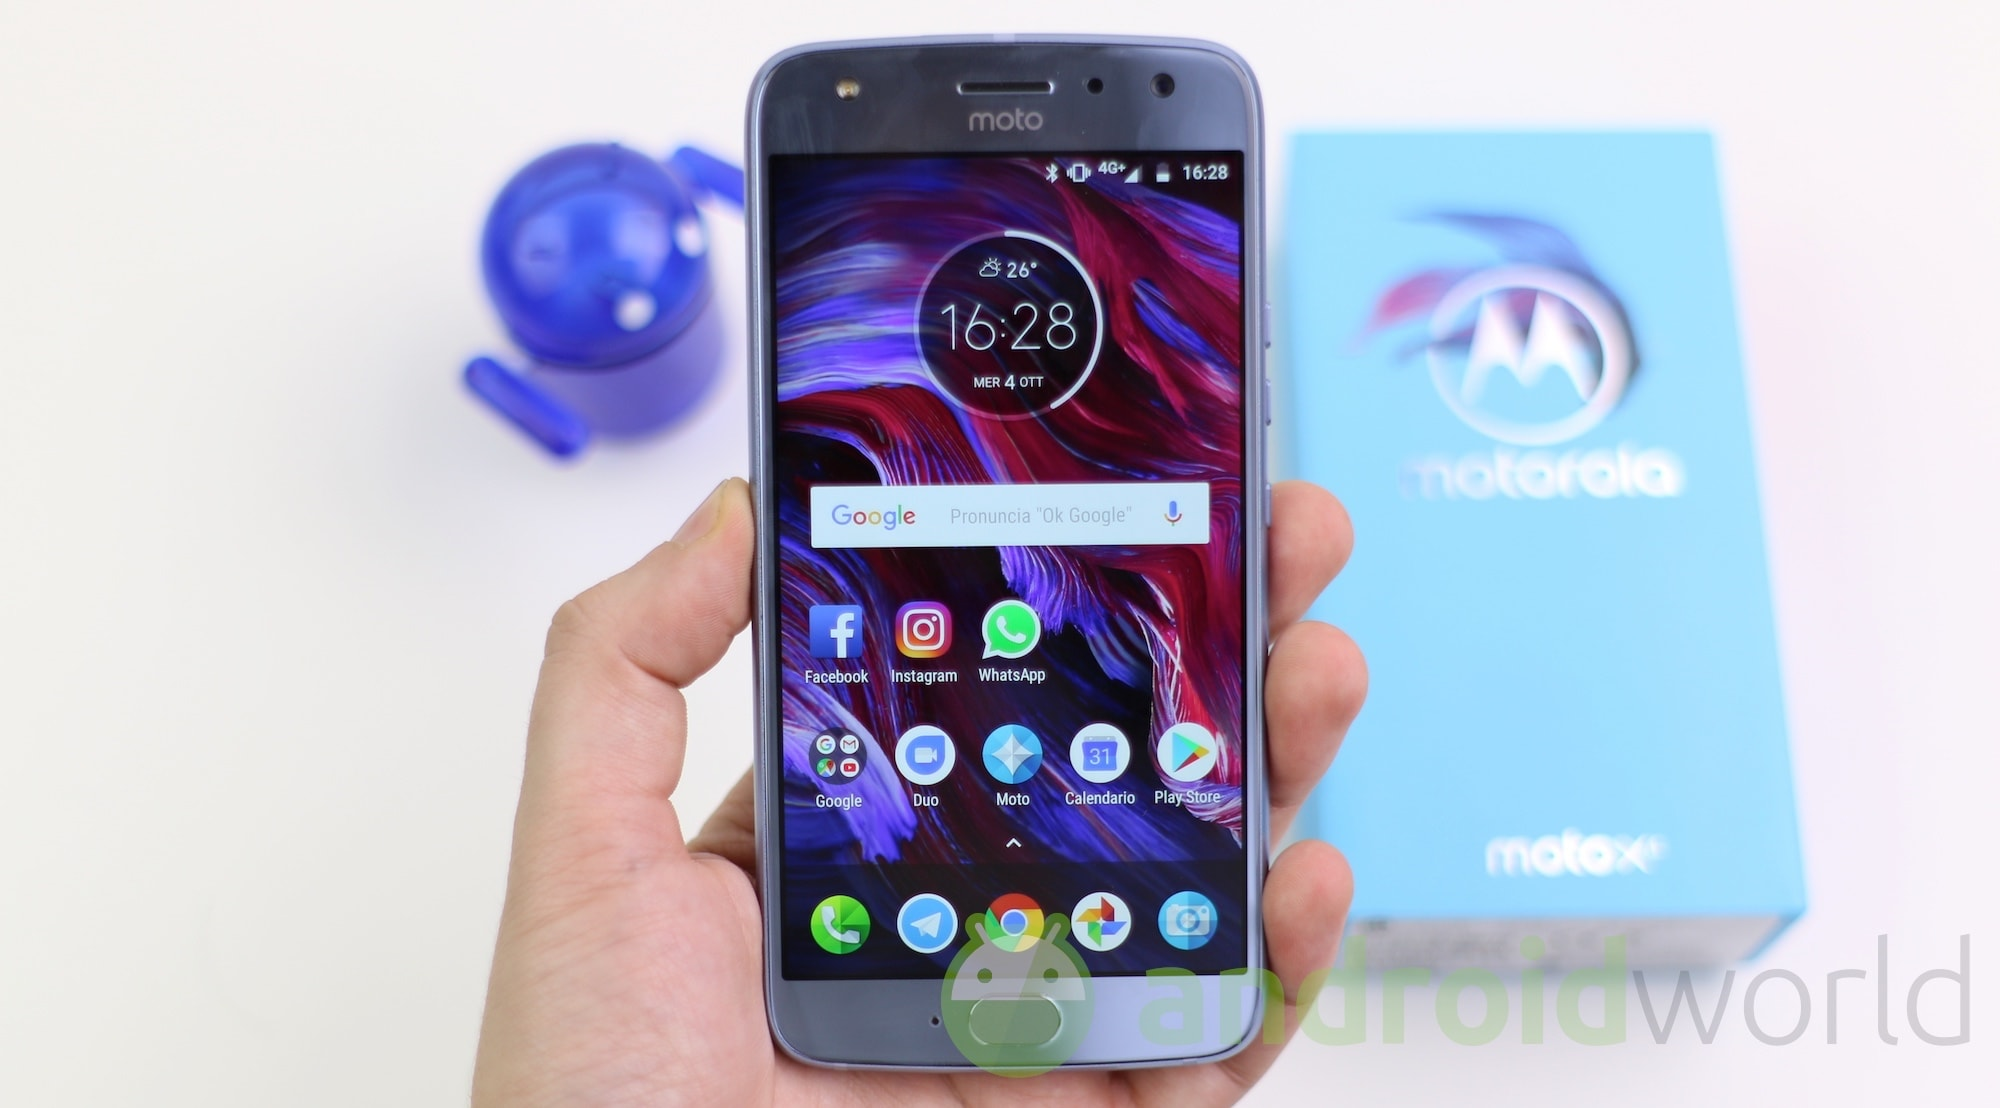 Motorola Moto X4 def – 10